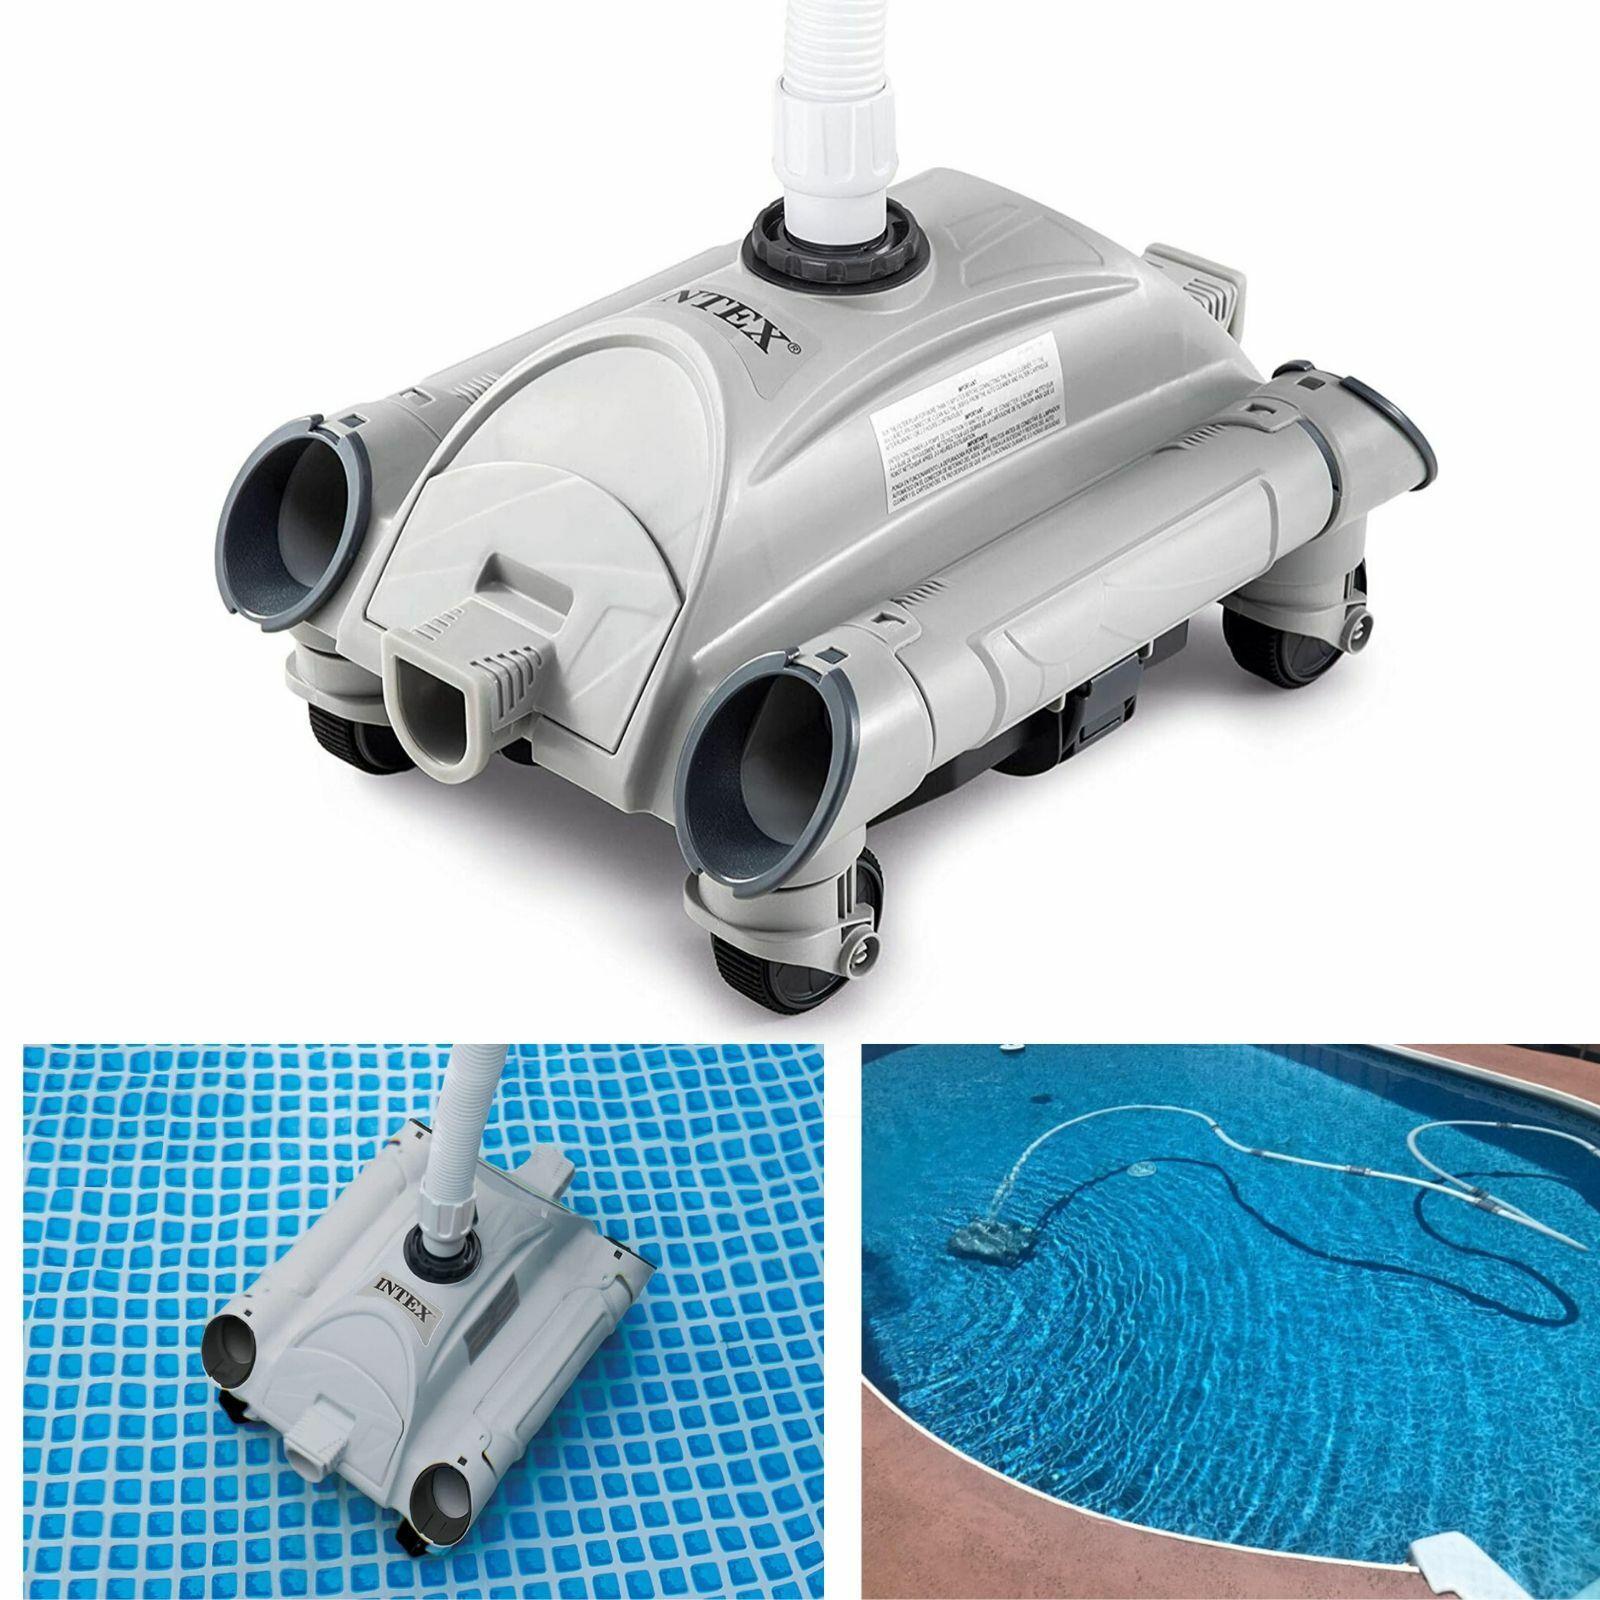 Intex Automatic Pool Cleaner Pressure Side Vacuum Cleaner w/